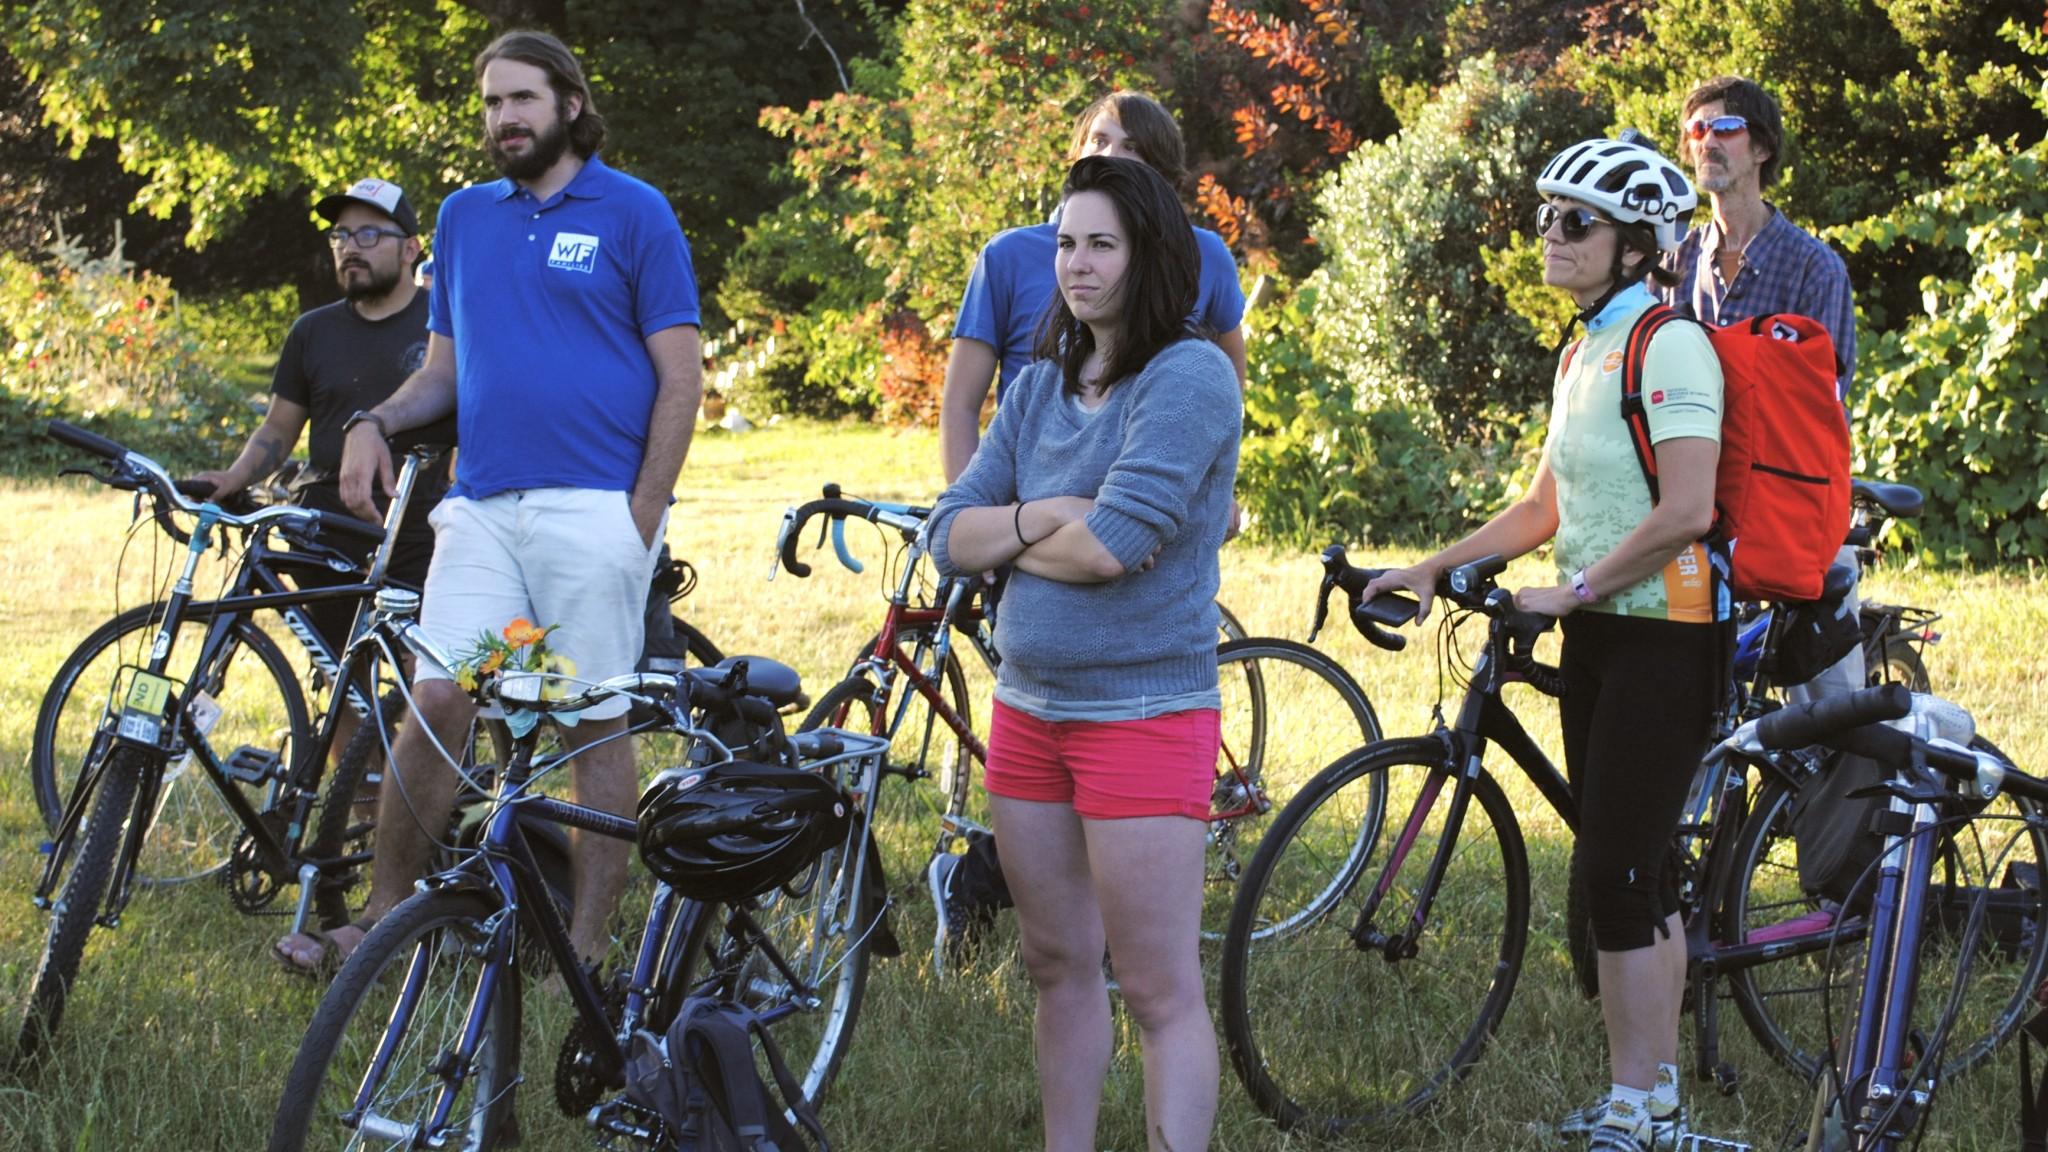 North Portland Tour Des Tanks Bike Ride @ University of Portland (Pilot House Patio)